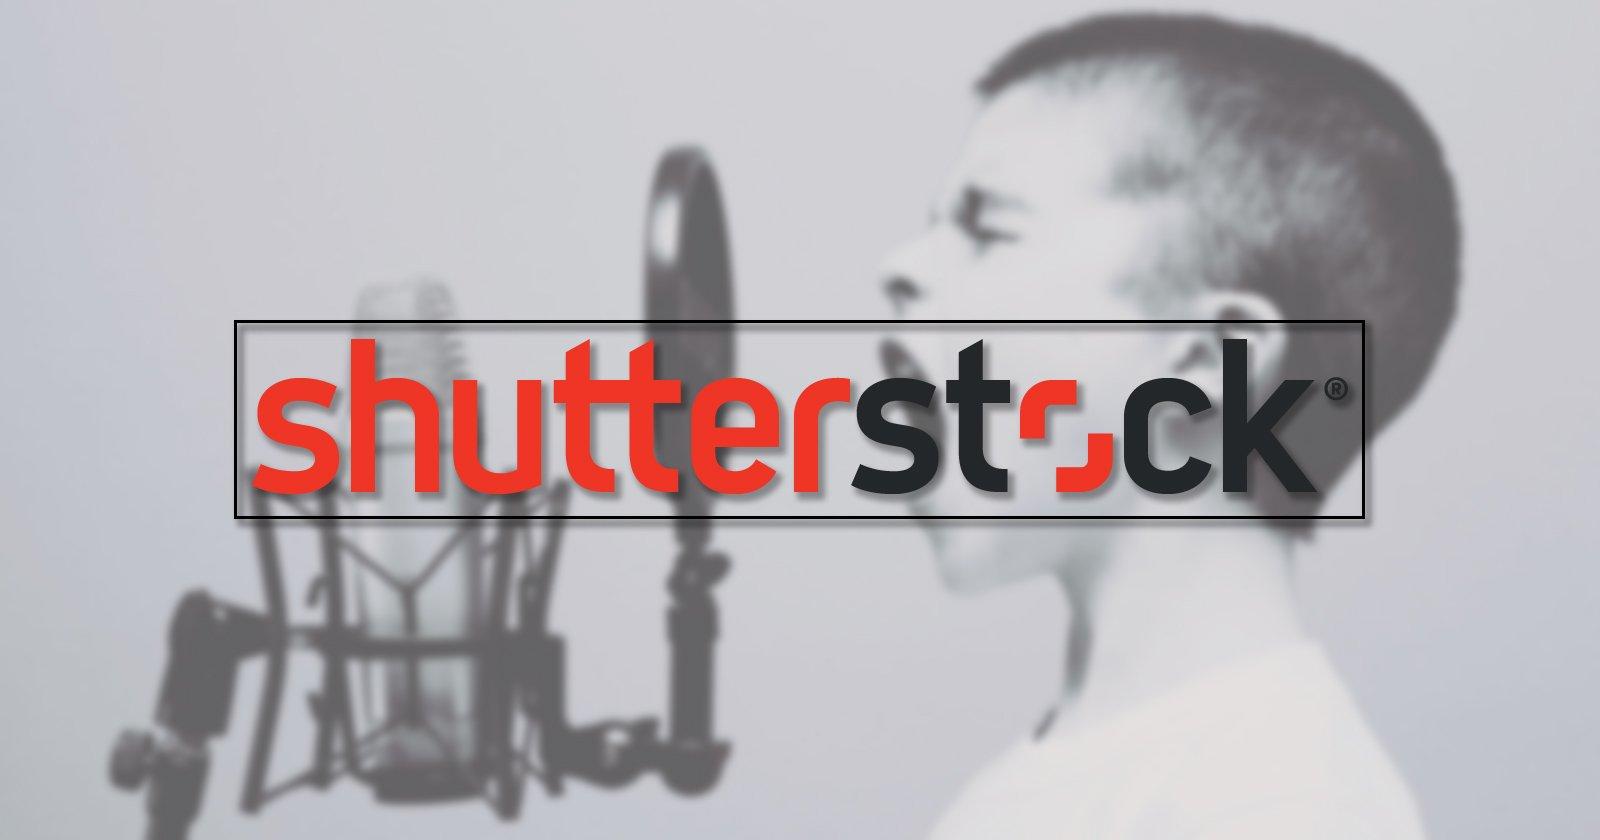 New Stock Coalition Calls for 'Global Shutdown' of Shutterstock Portfolios Over Low Royalties